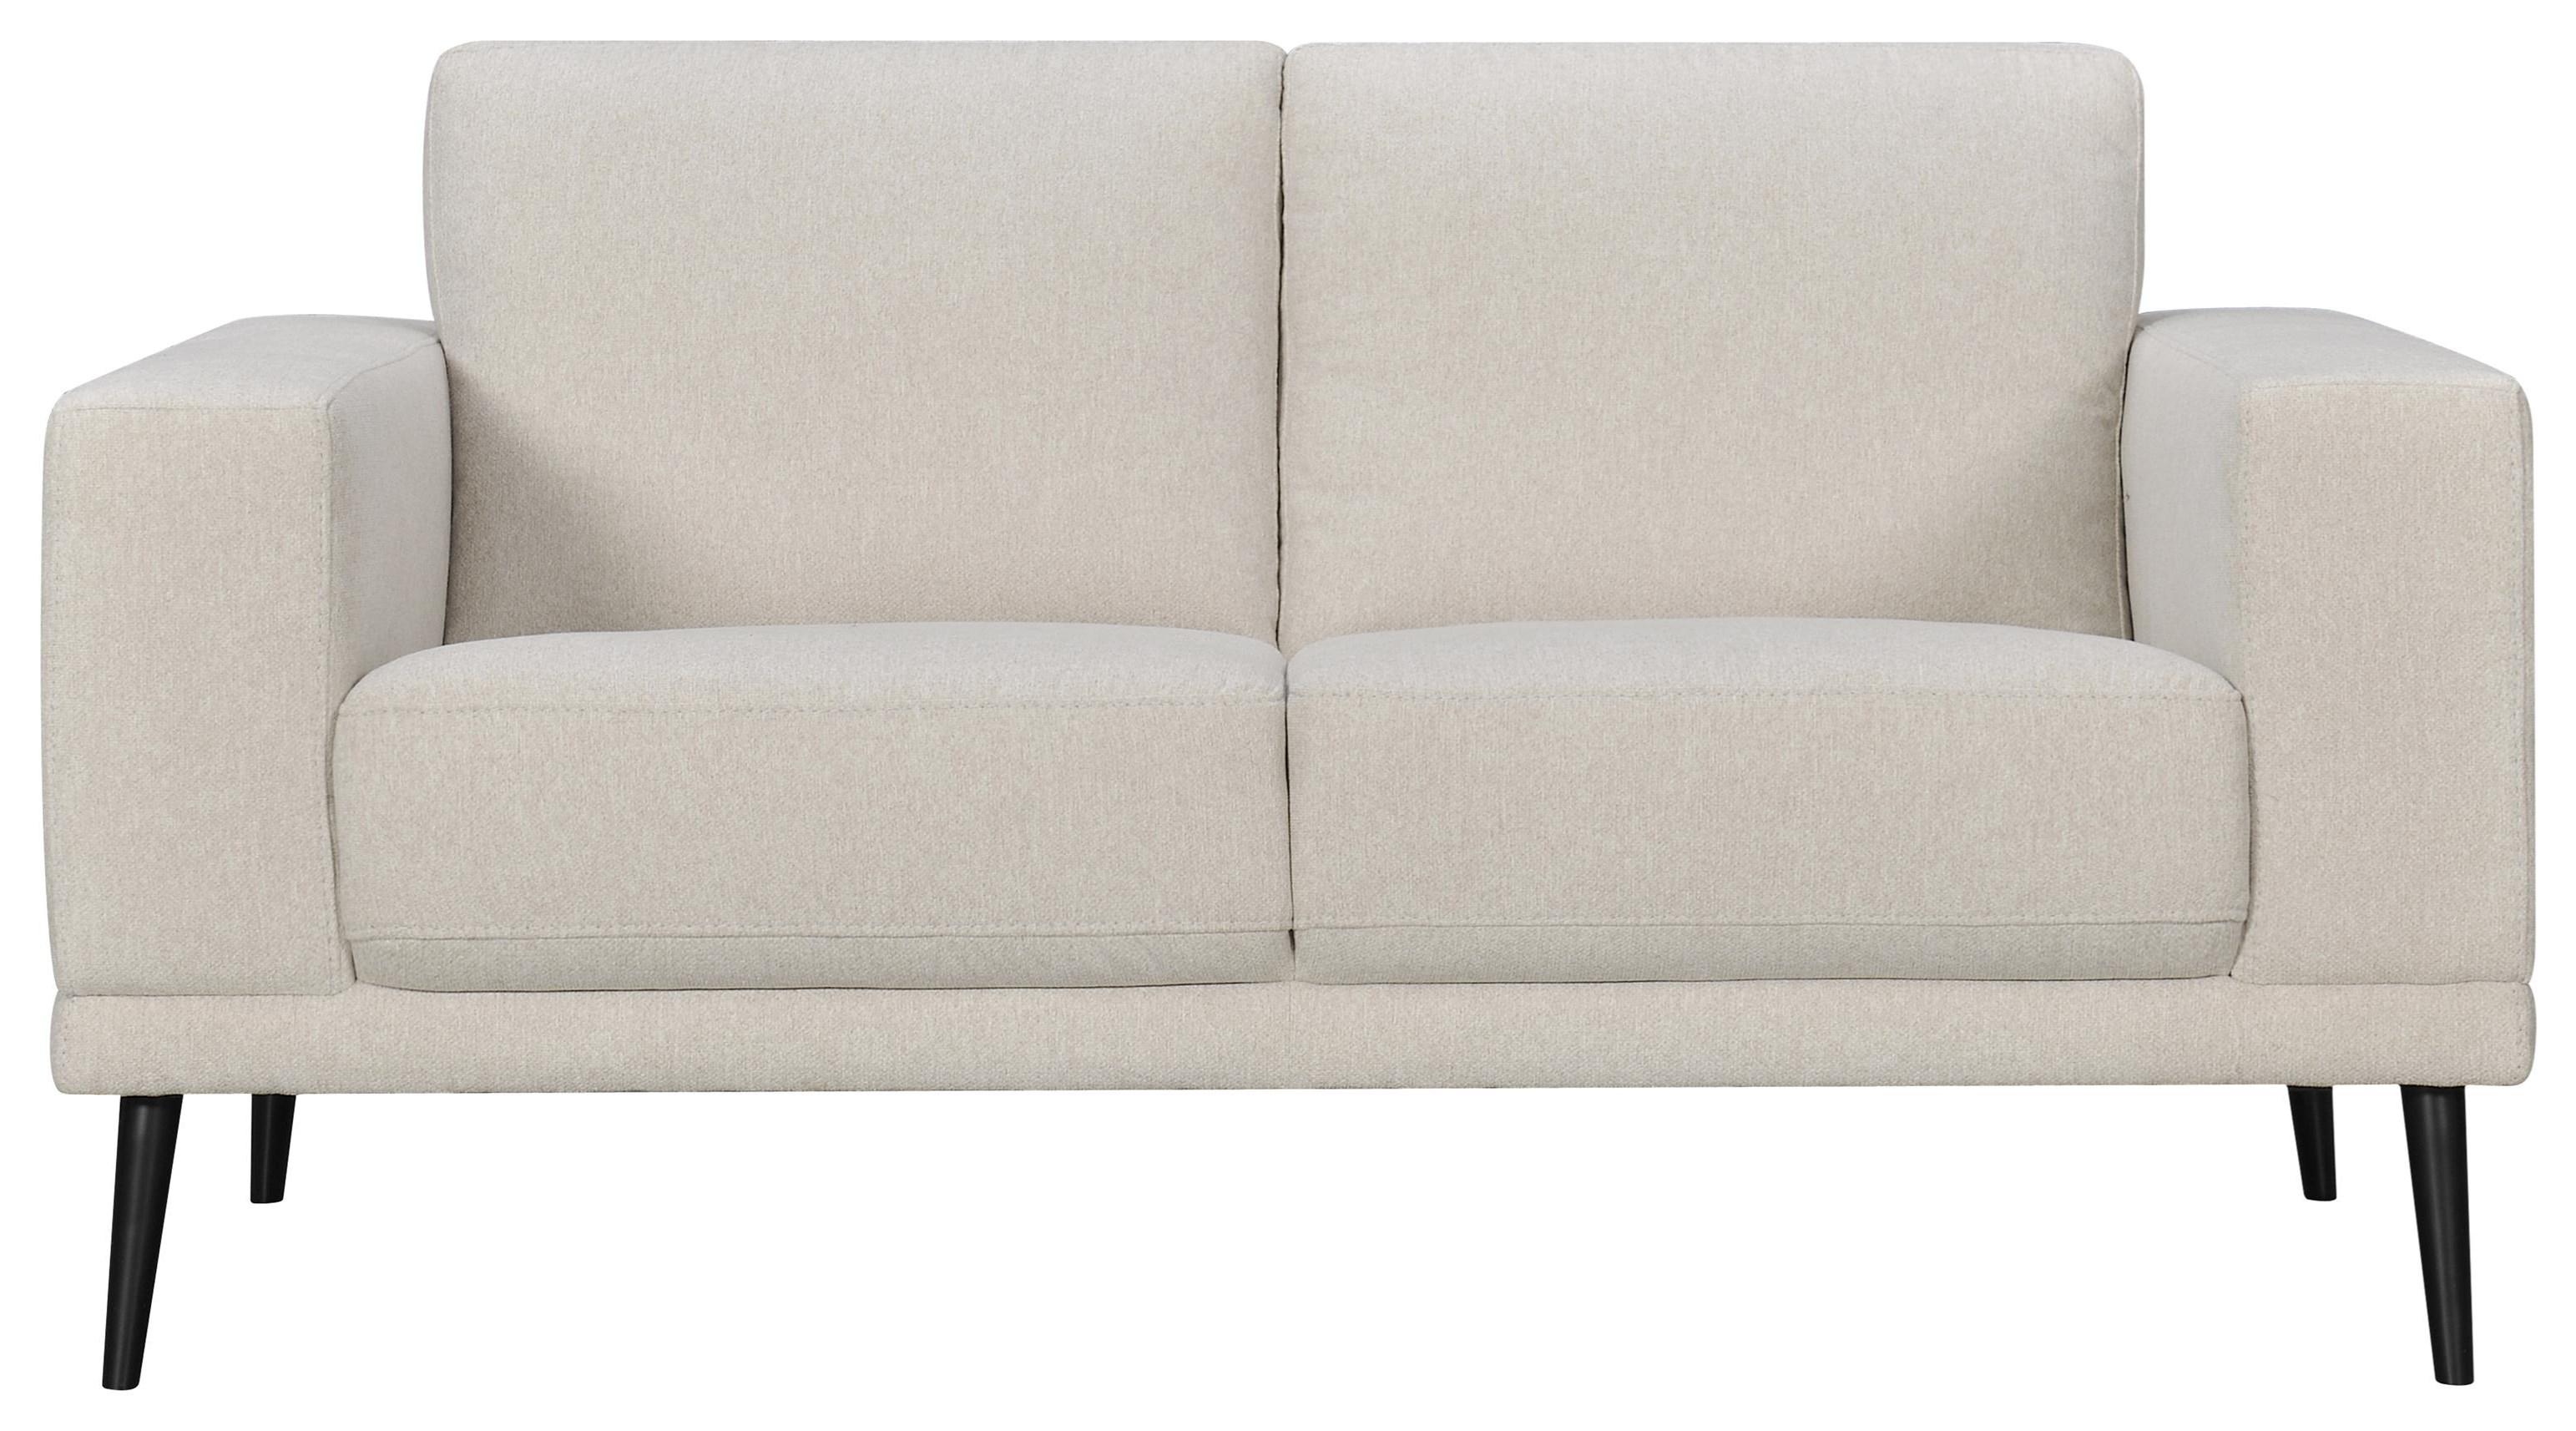 Harlow Loveseat by Violino at HomeWorld Furniture